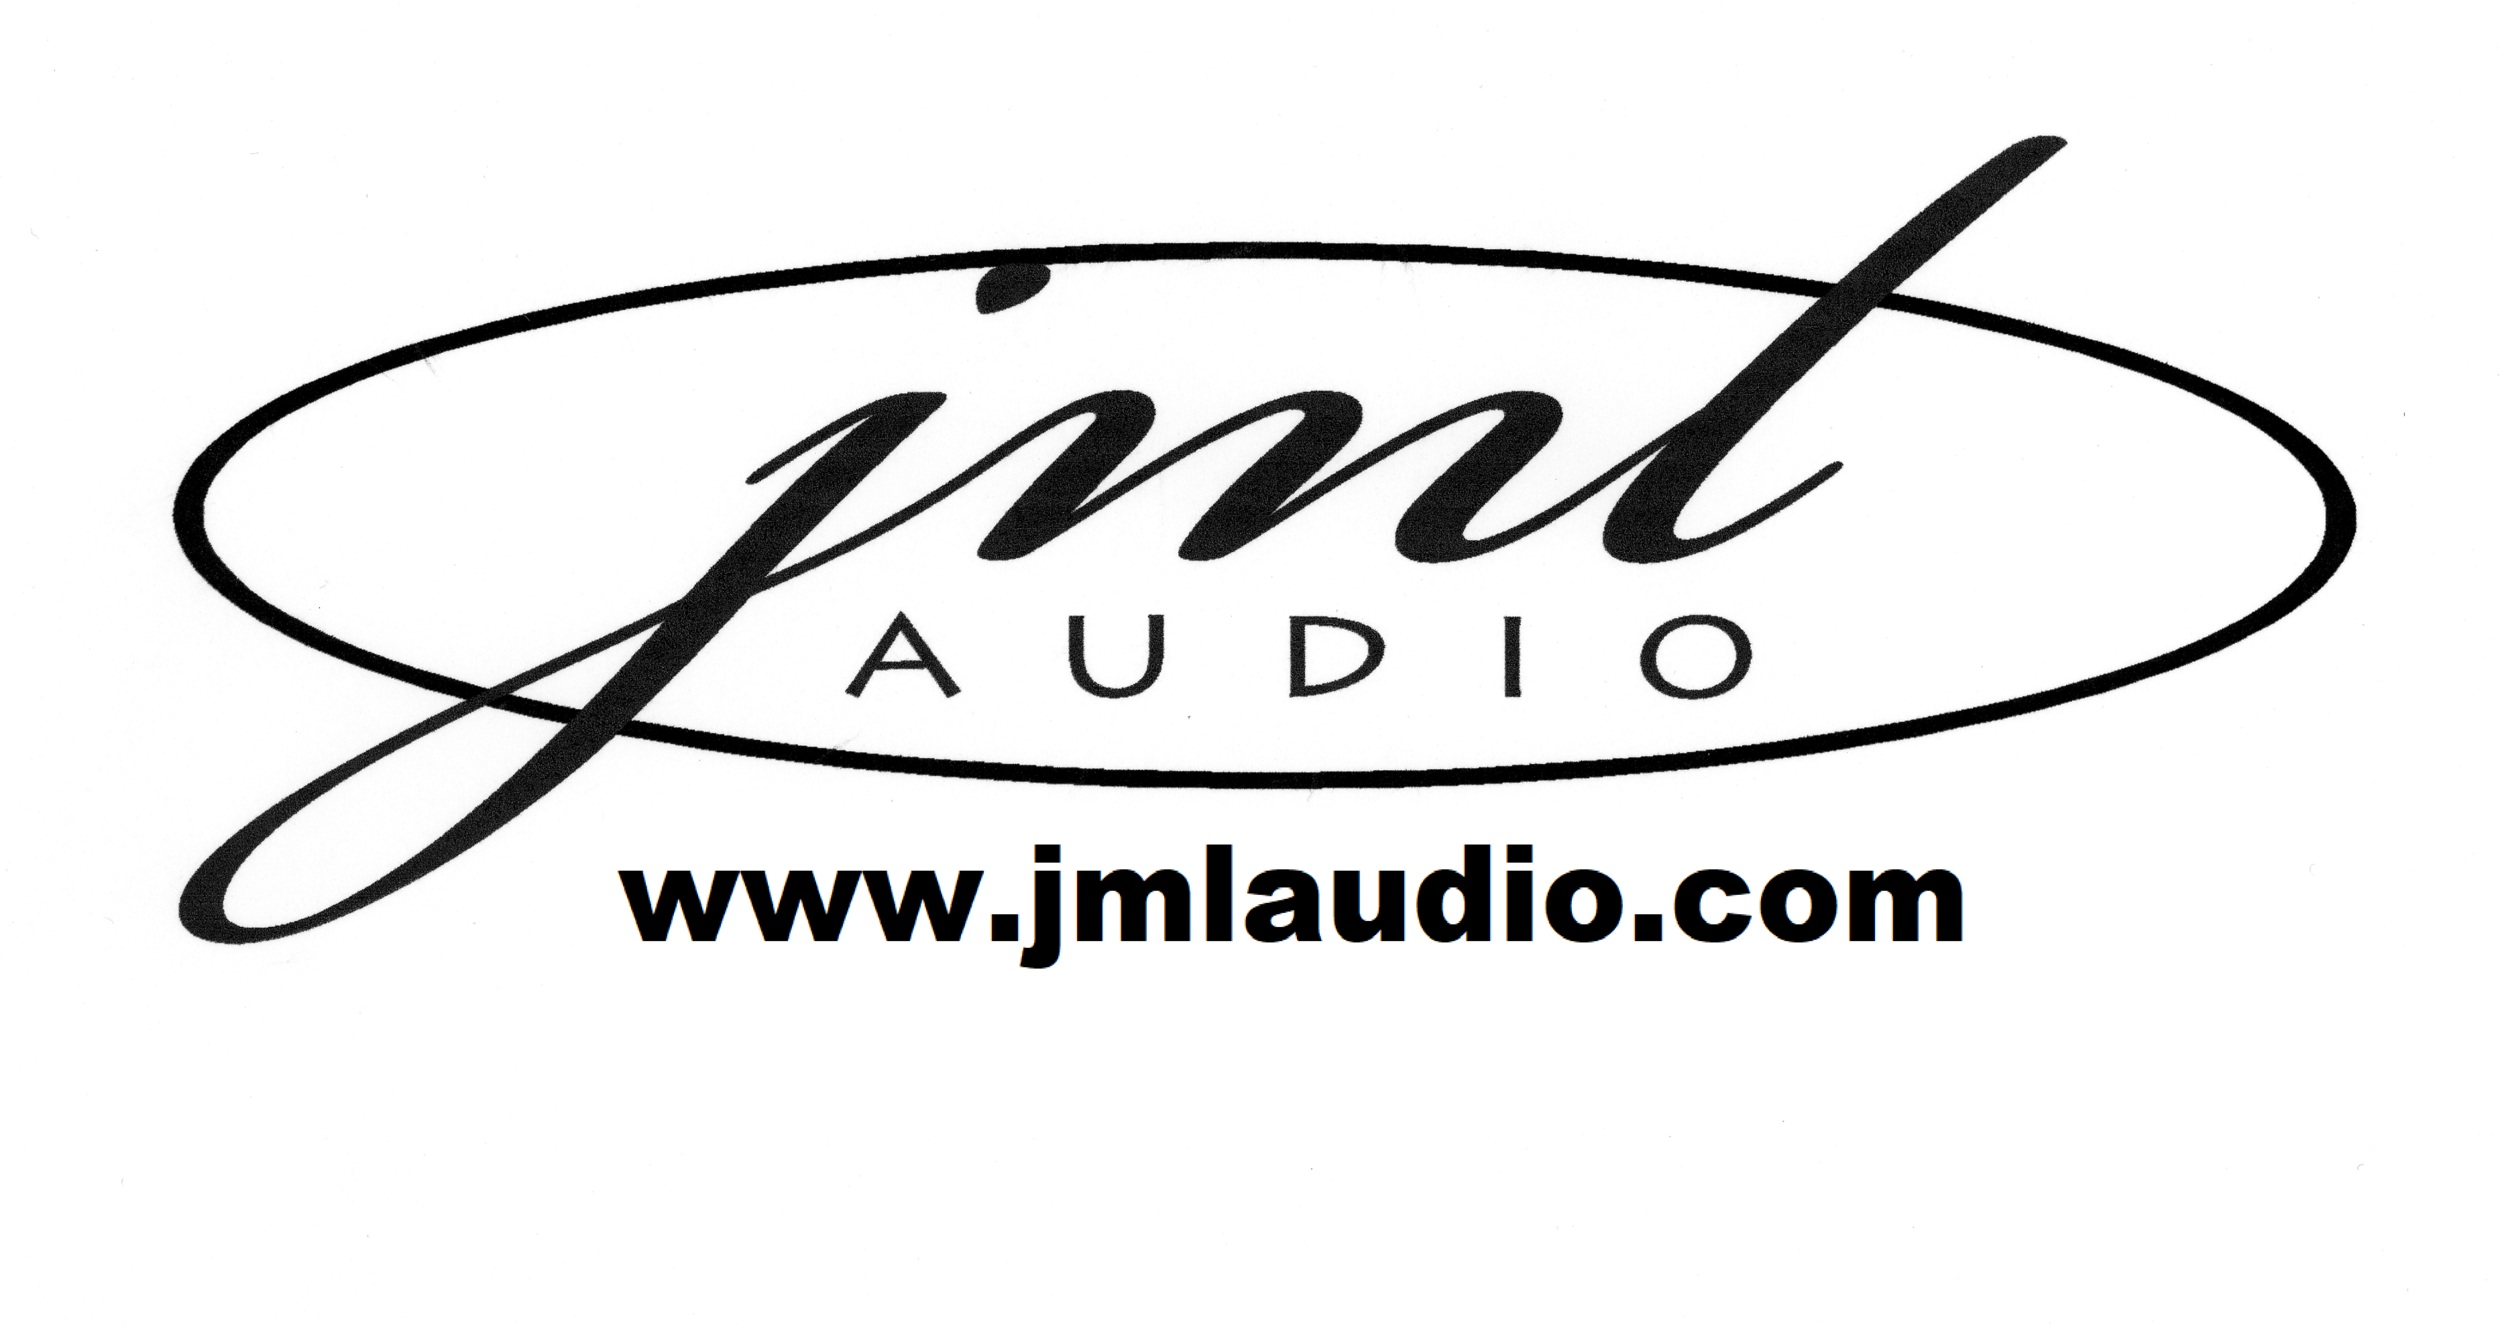 JMLLOGOw+web+png+2-5-19.jpg